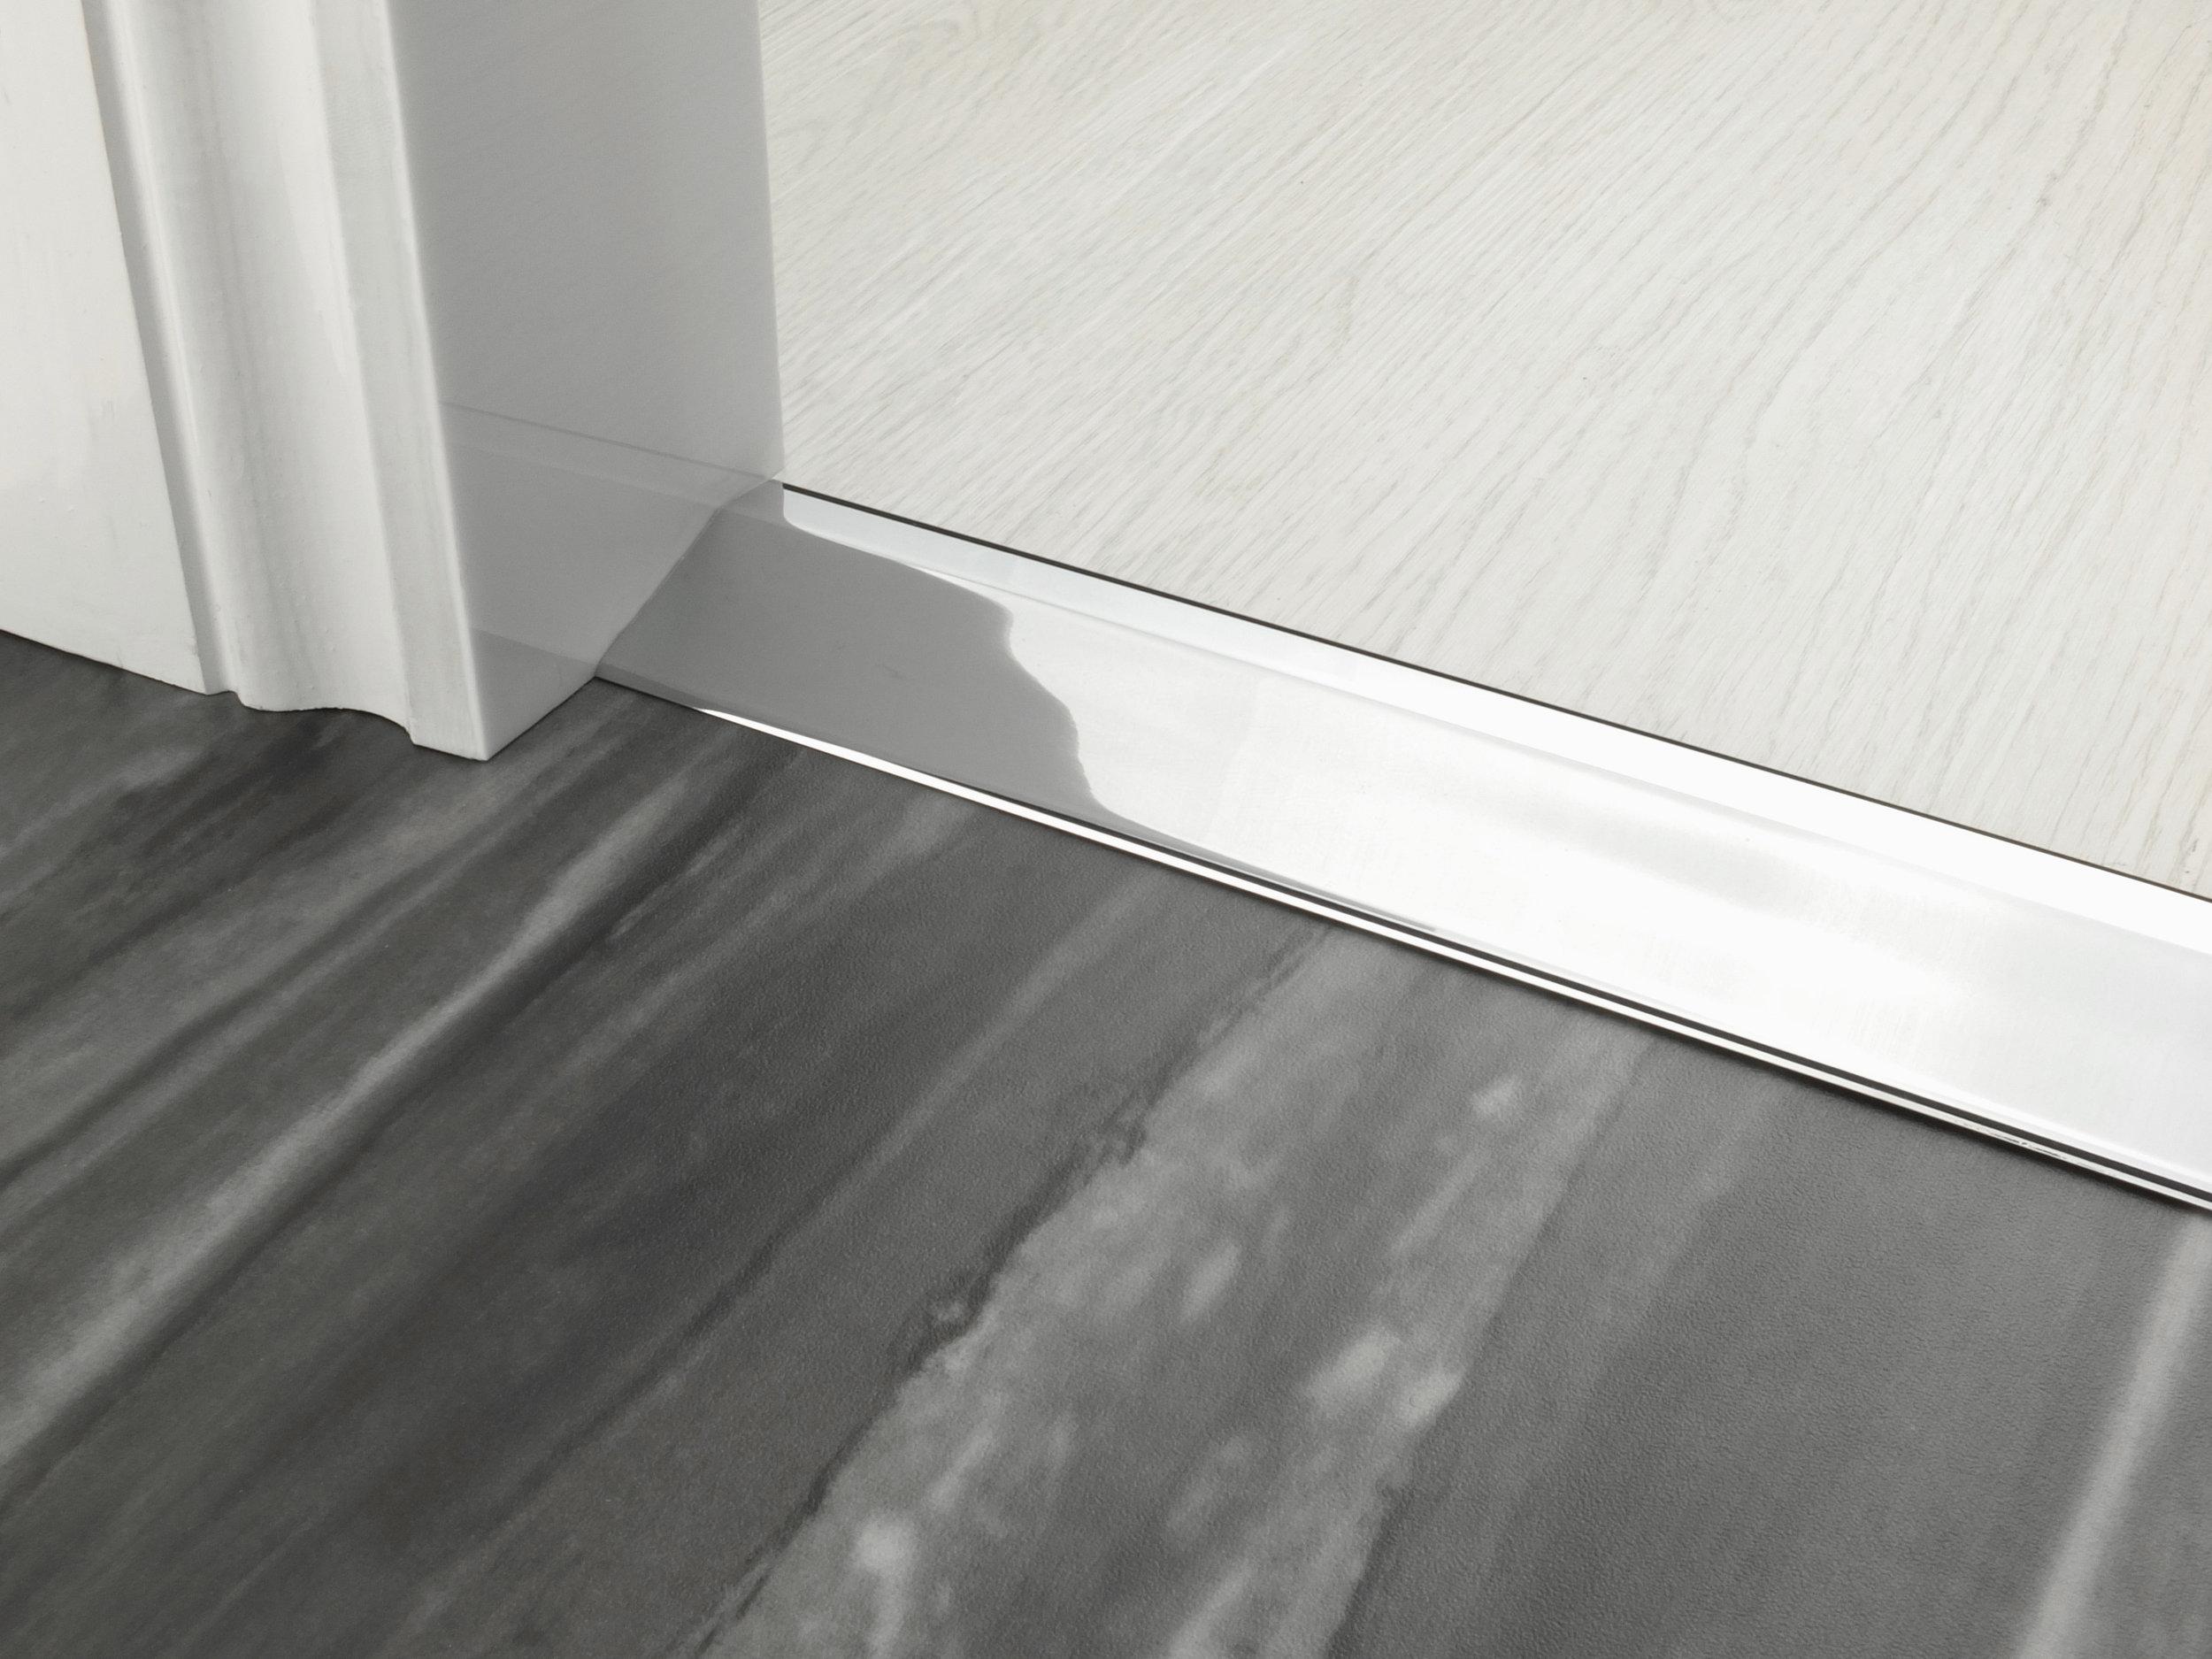 stairrods-doorbar-chrome-16mm-ramp.jpg